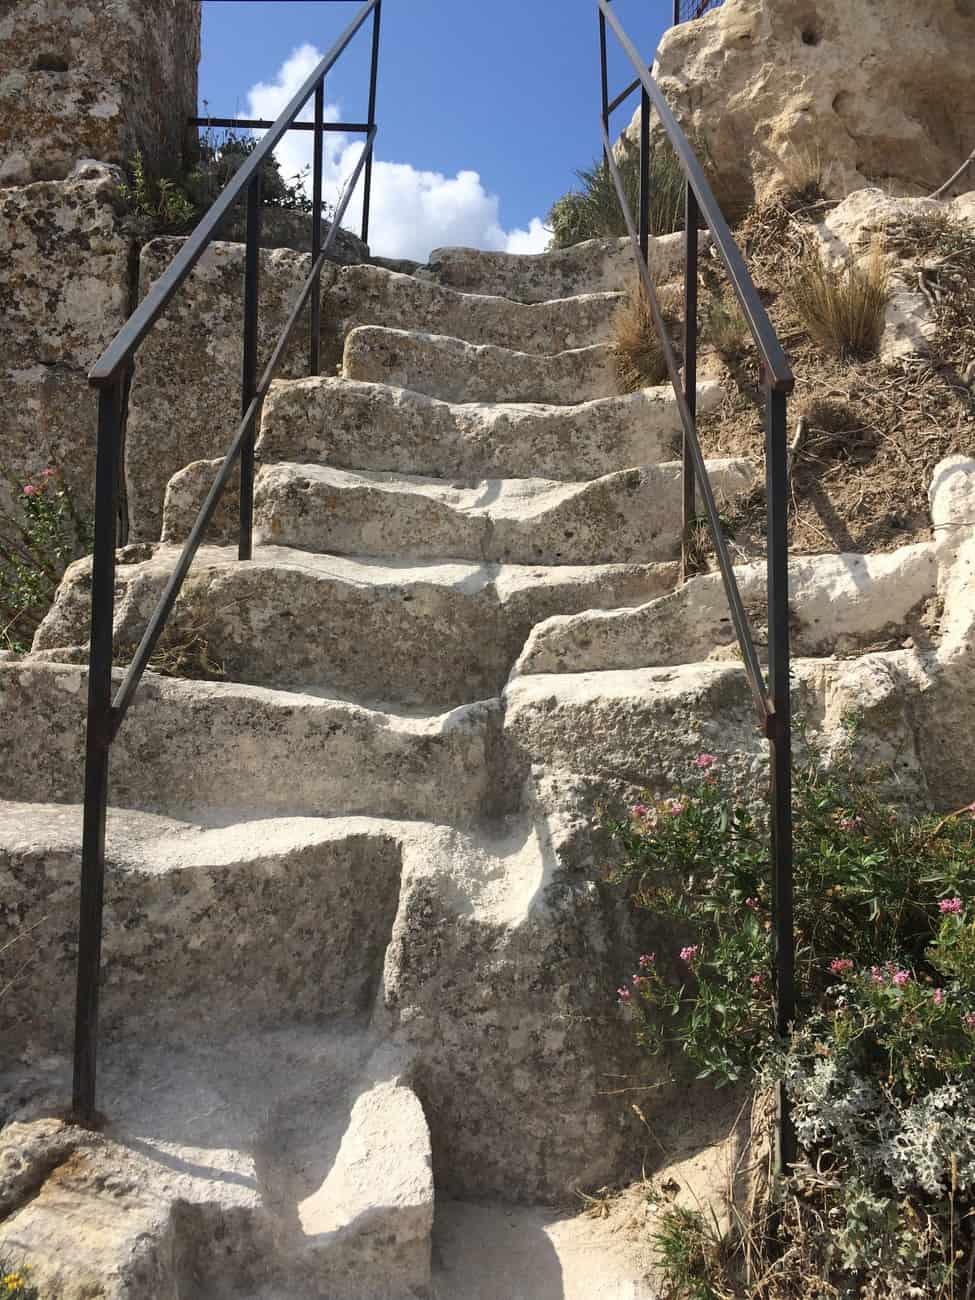 Les Baux - weathered steps